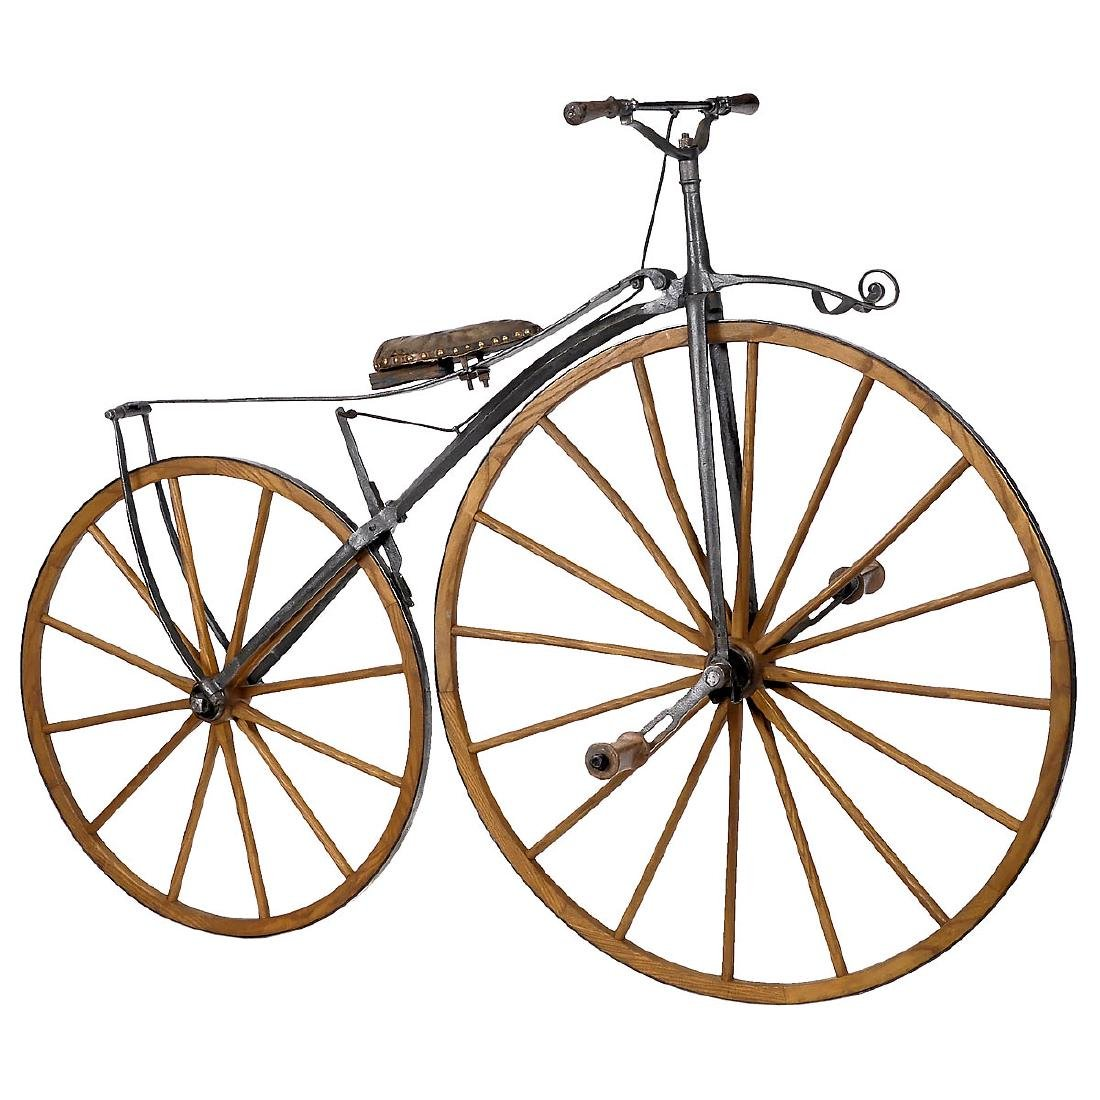 Boneshaker Bicycle, c. 1868